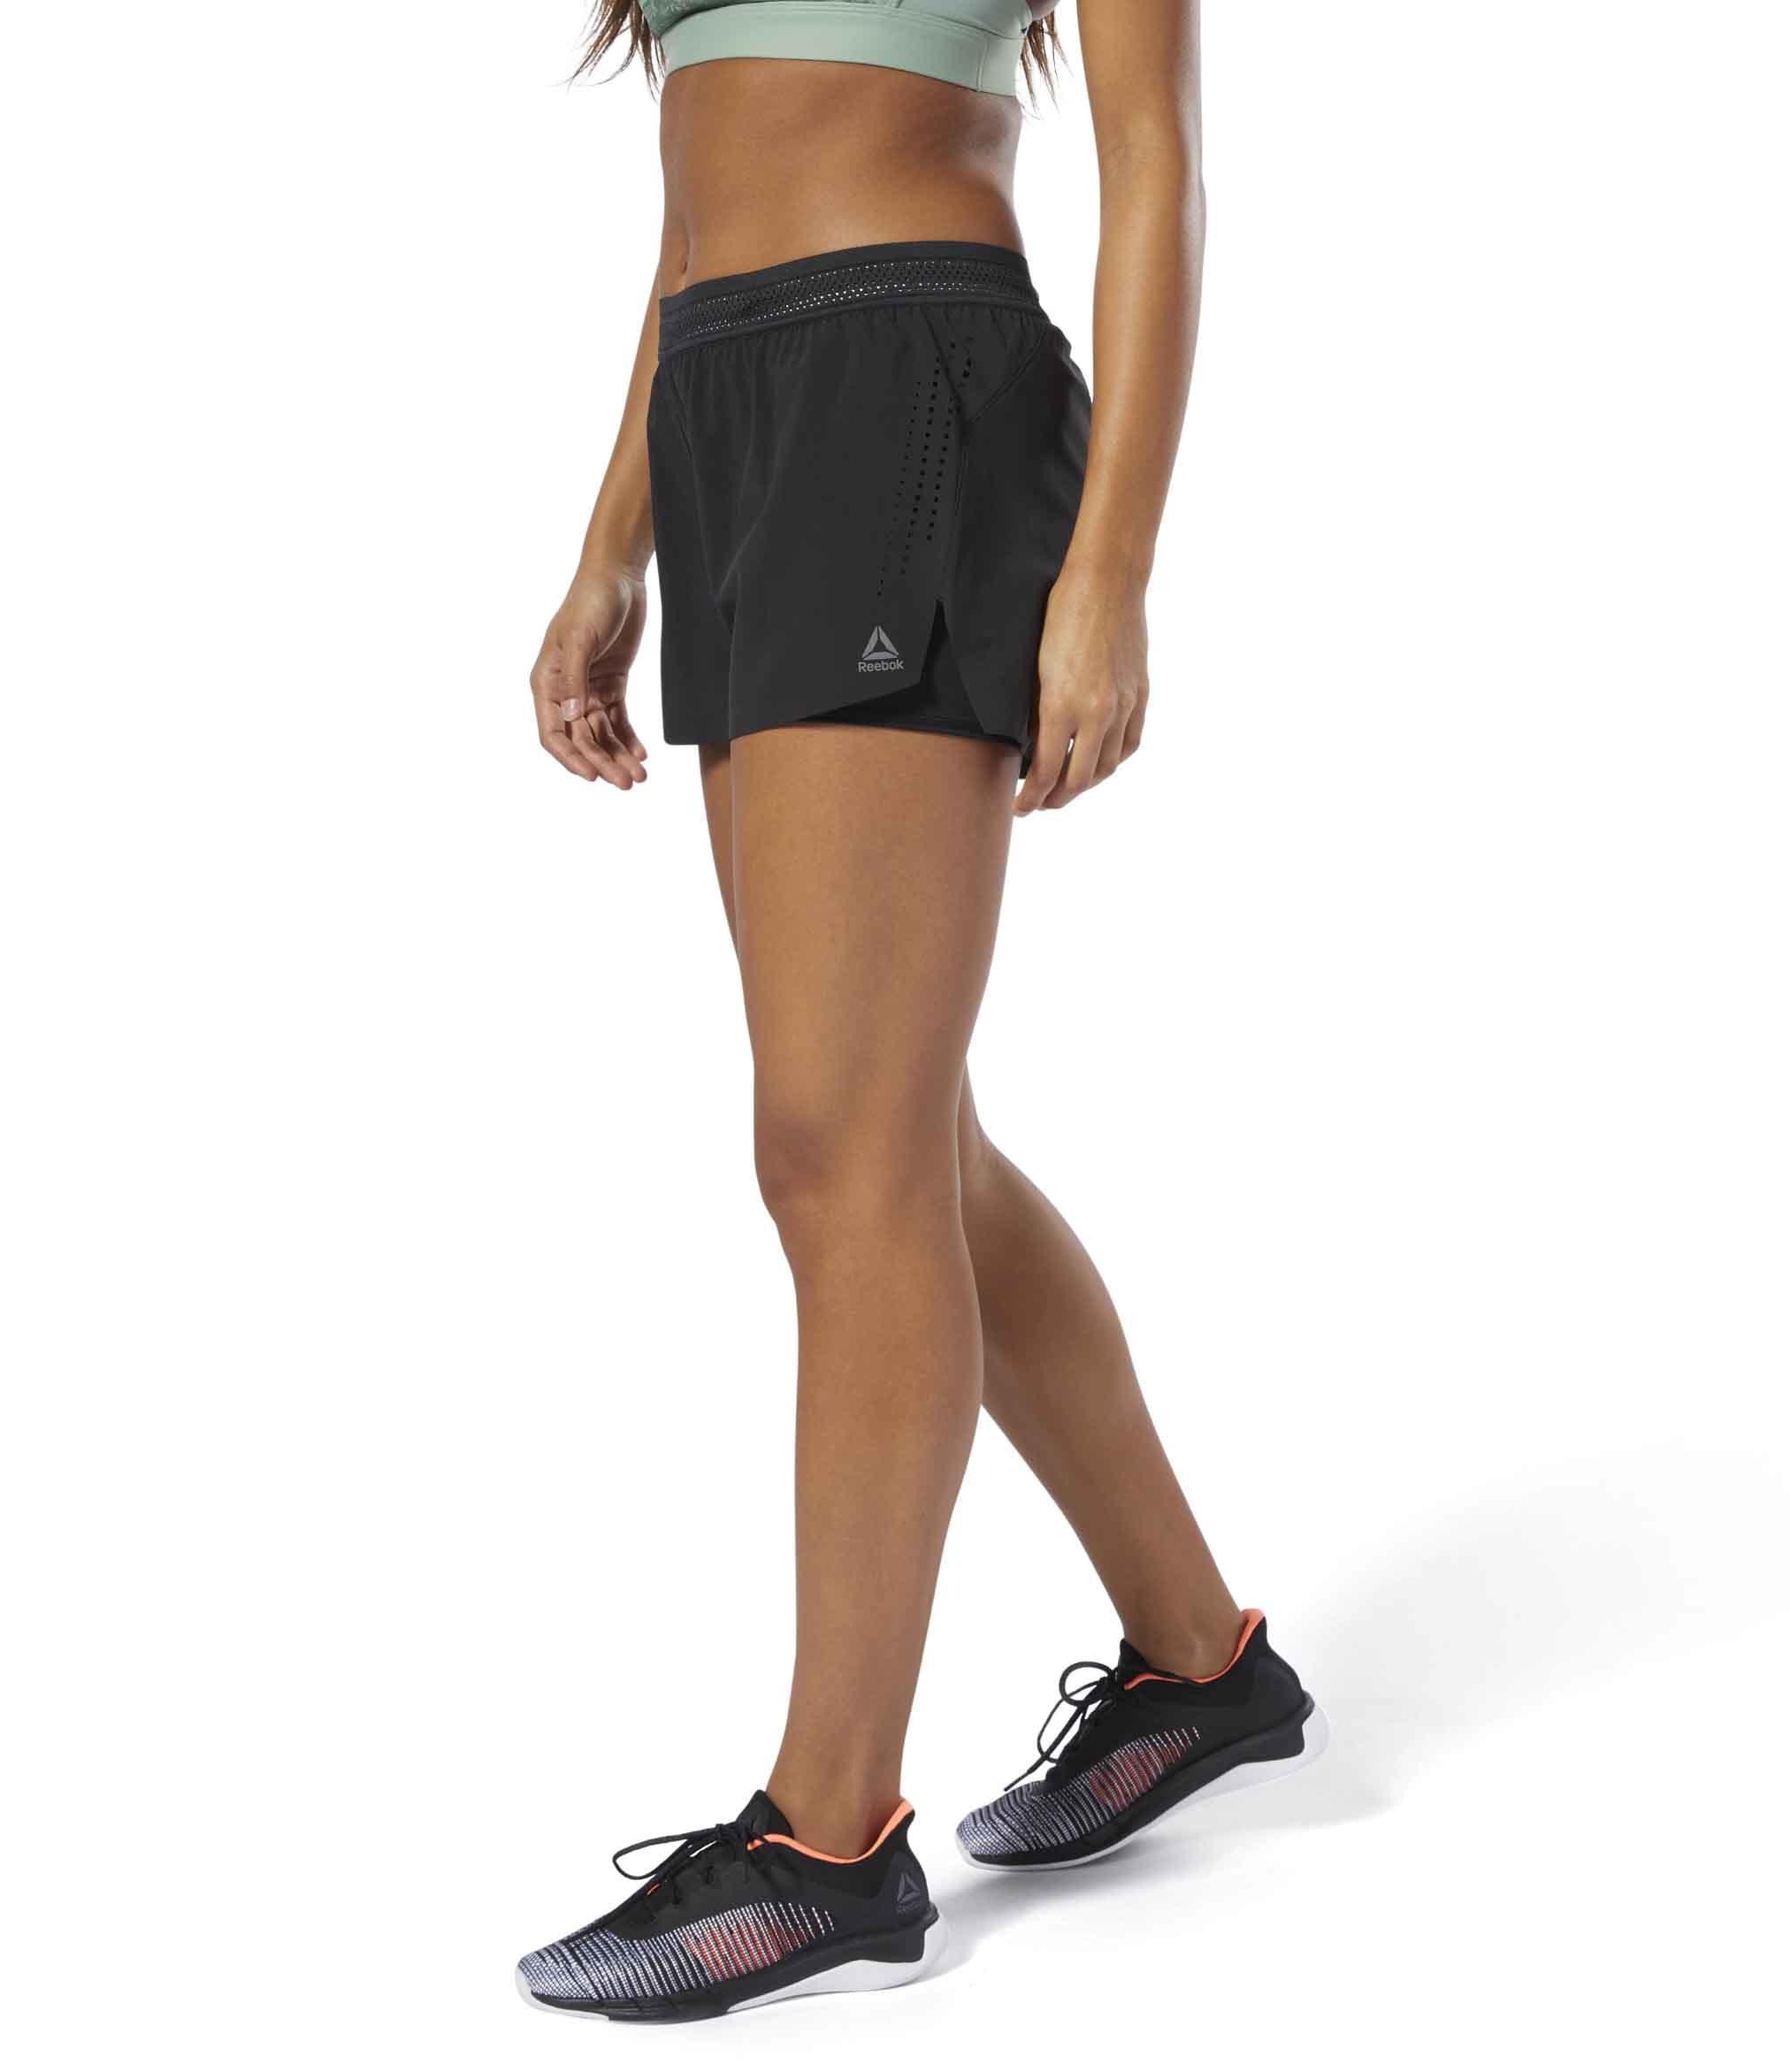 crossfit-shorts-epic-short-2